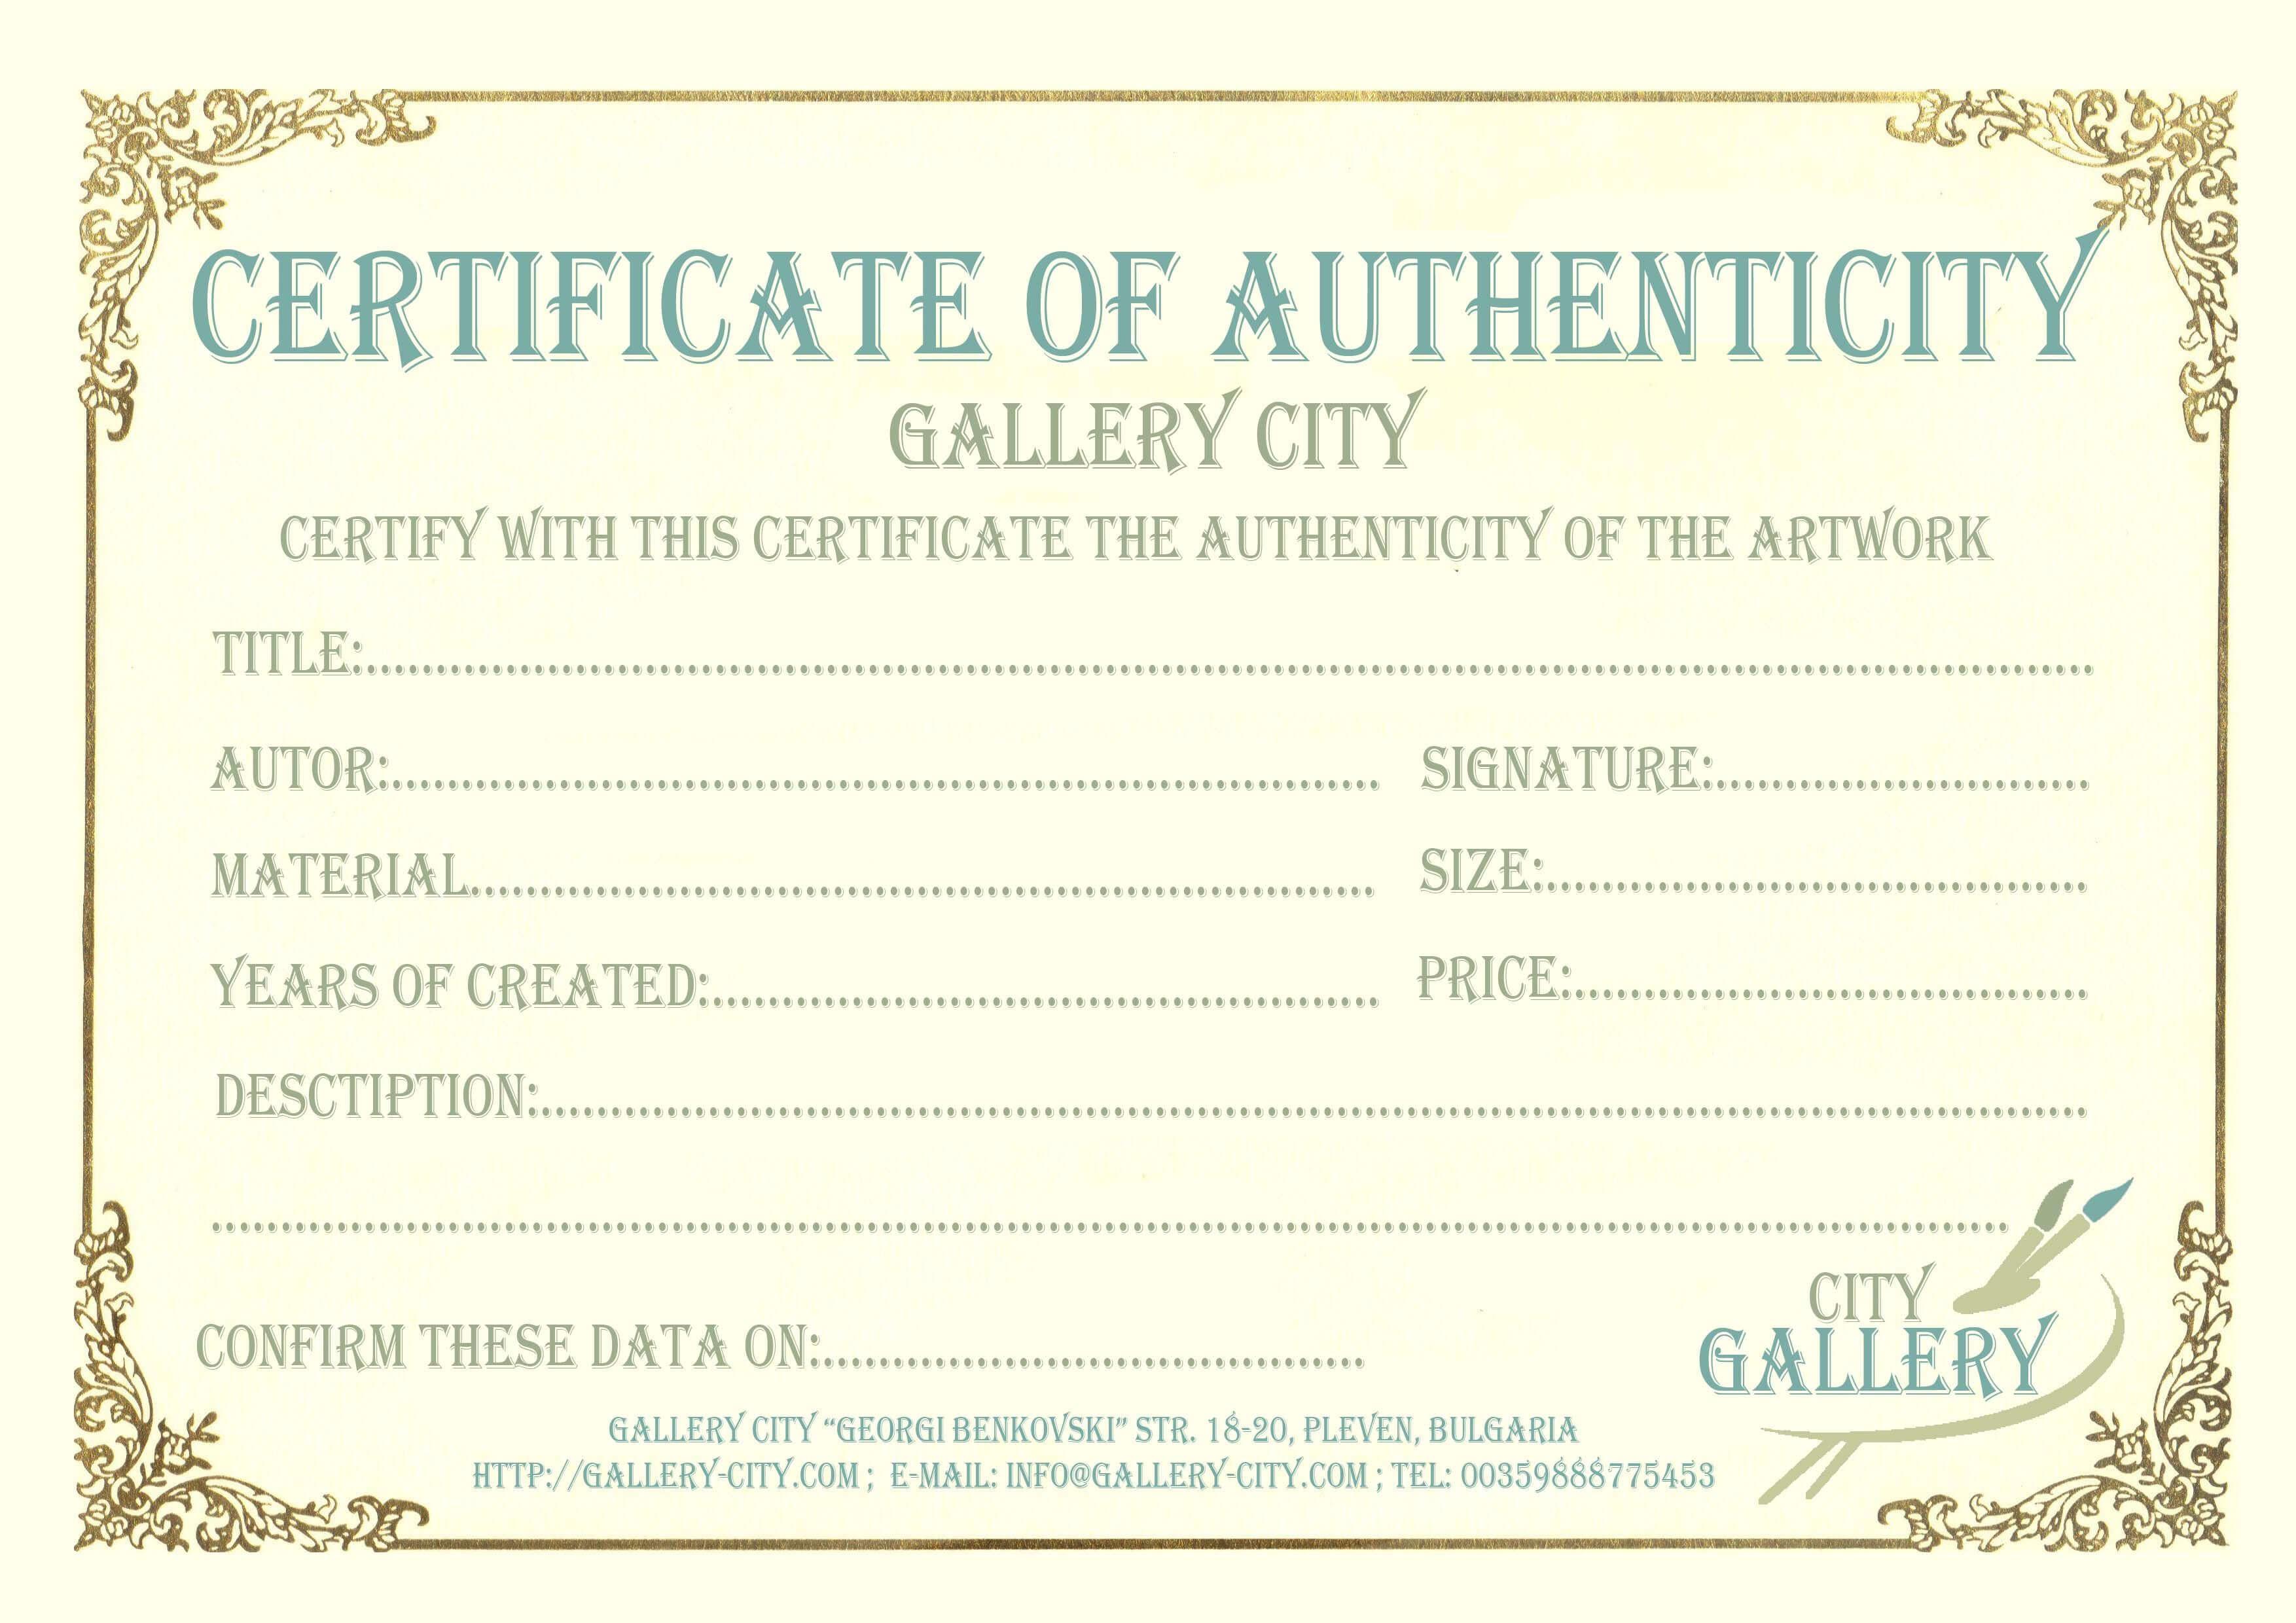 Certificate Authenticity Template Art Authenticity For Certificate Of Authenticity Template